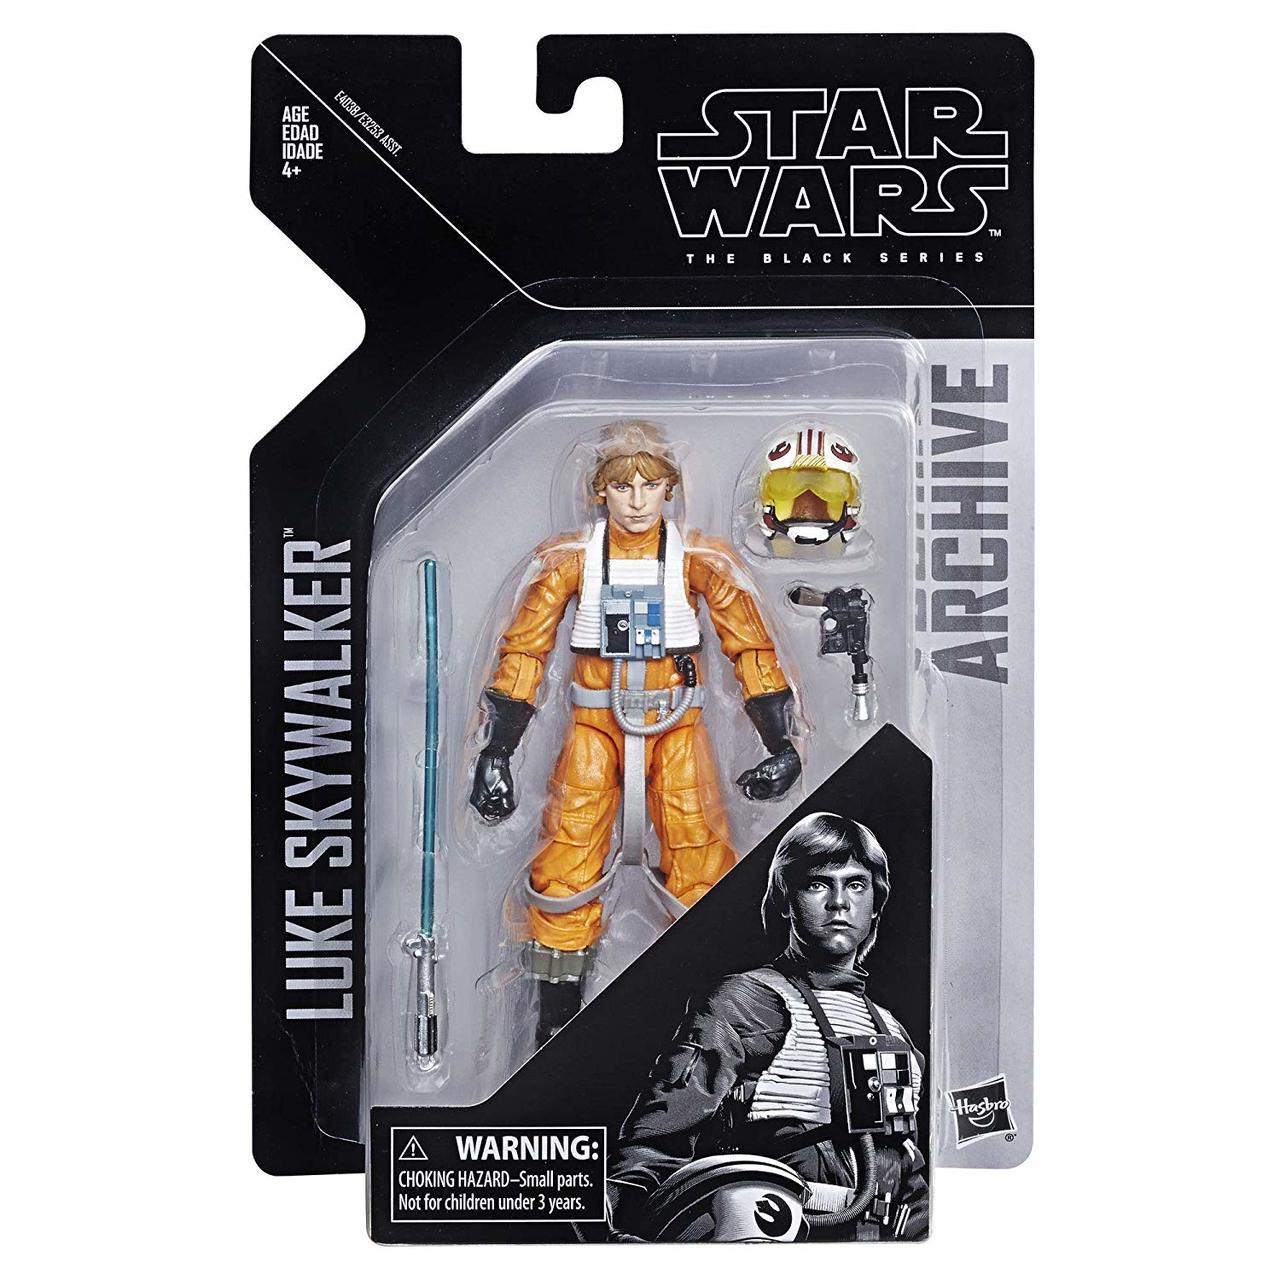 NEW Hasbro Star Wars The Force Awakens The Black Series 6-Inch Luke Skywalker